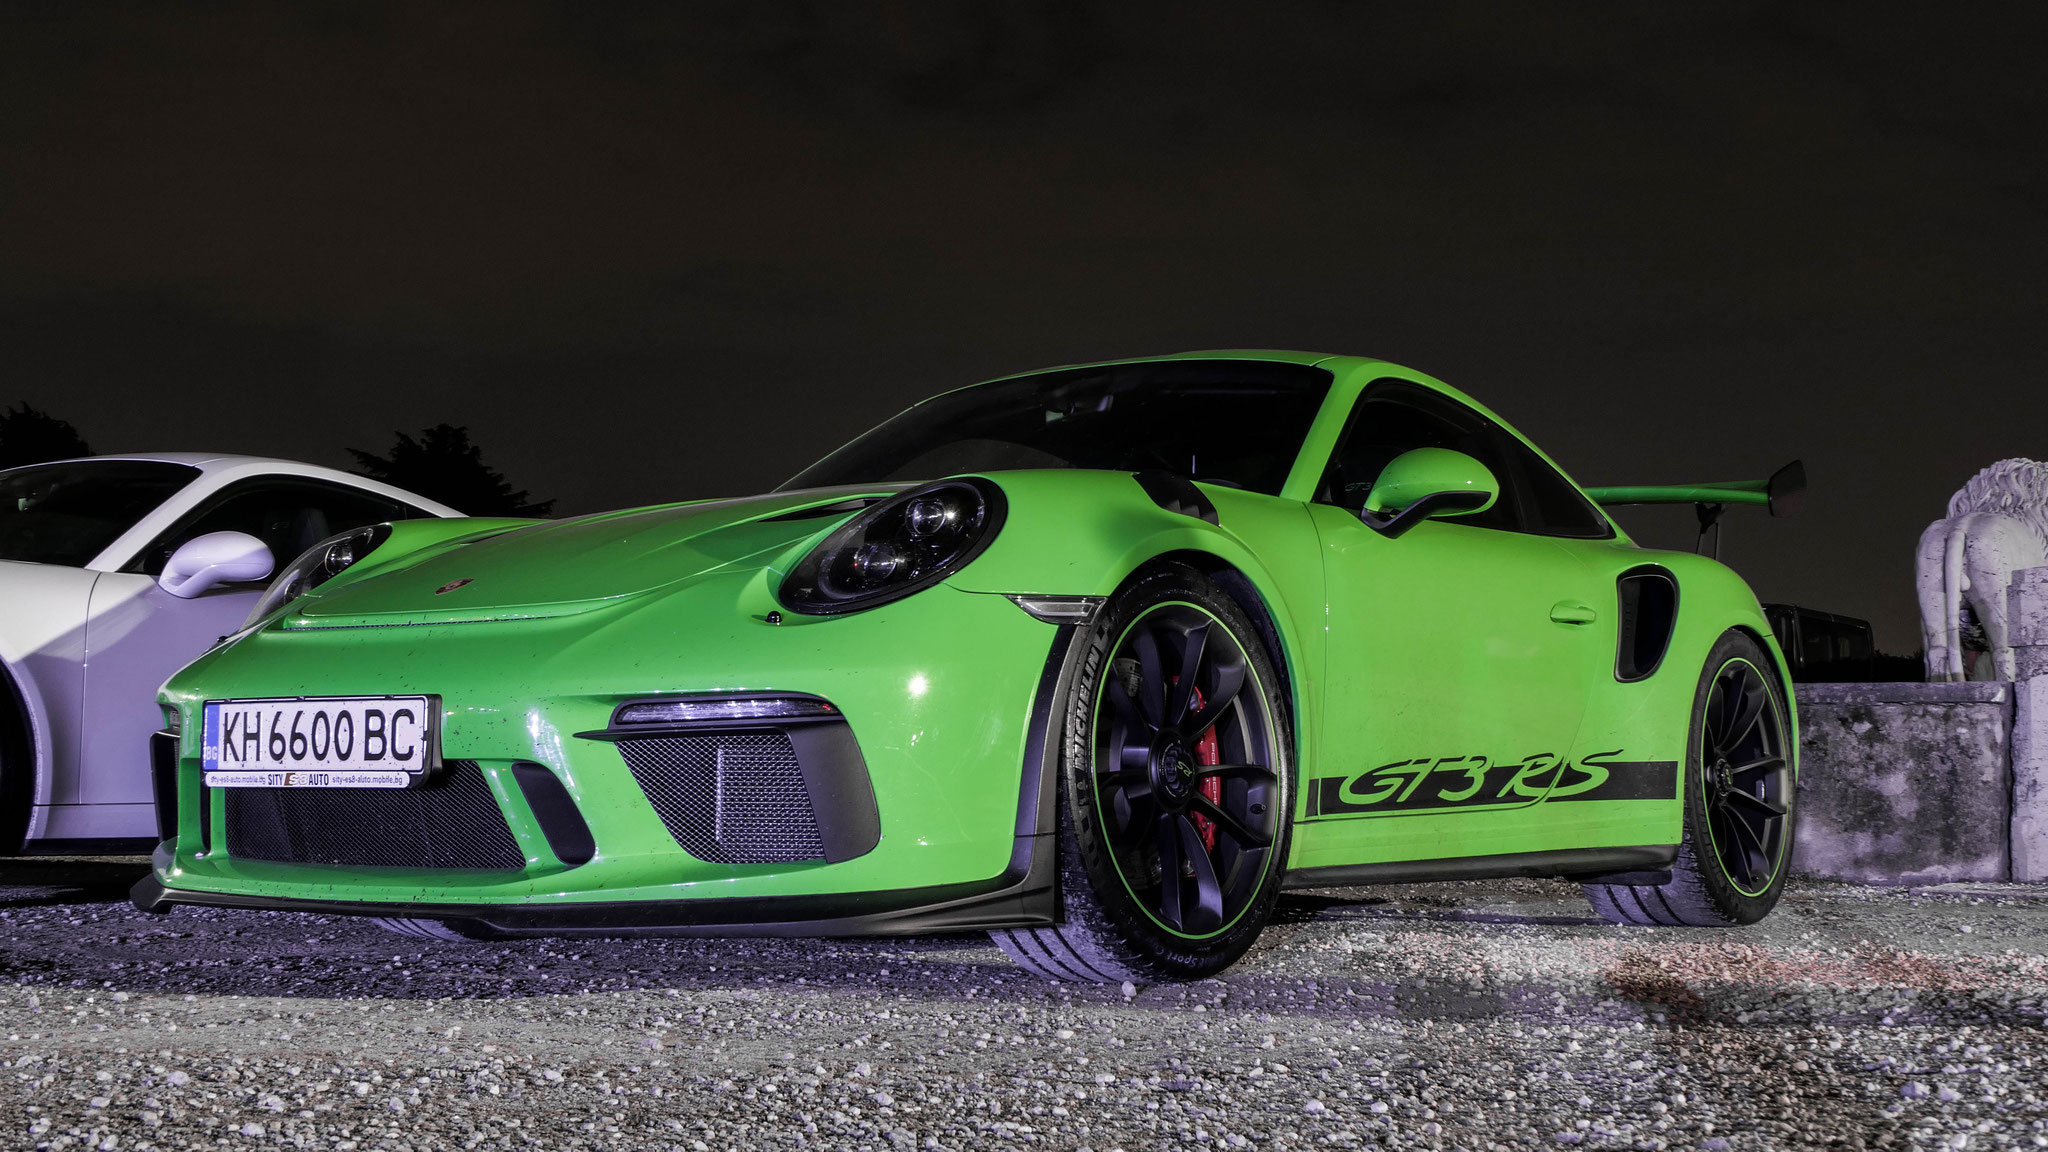 Porsche 911 991.2 GT3 RS - KH-6600-BC (BG)